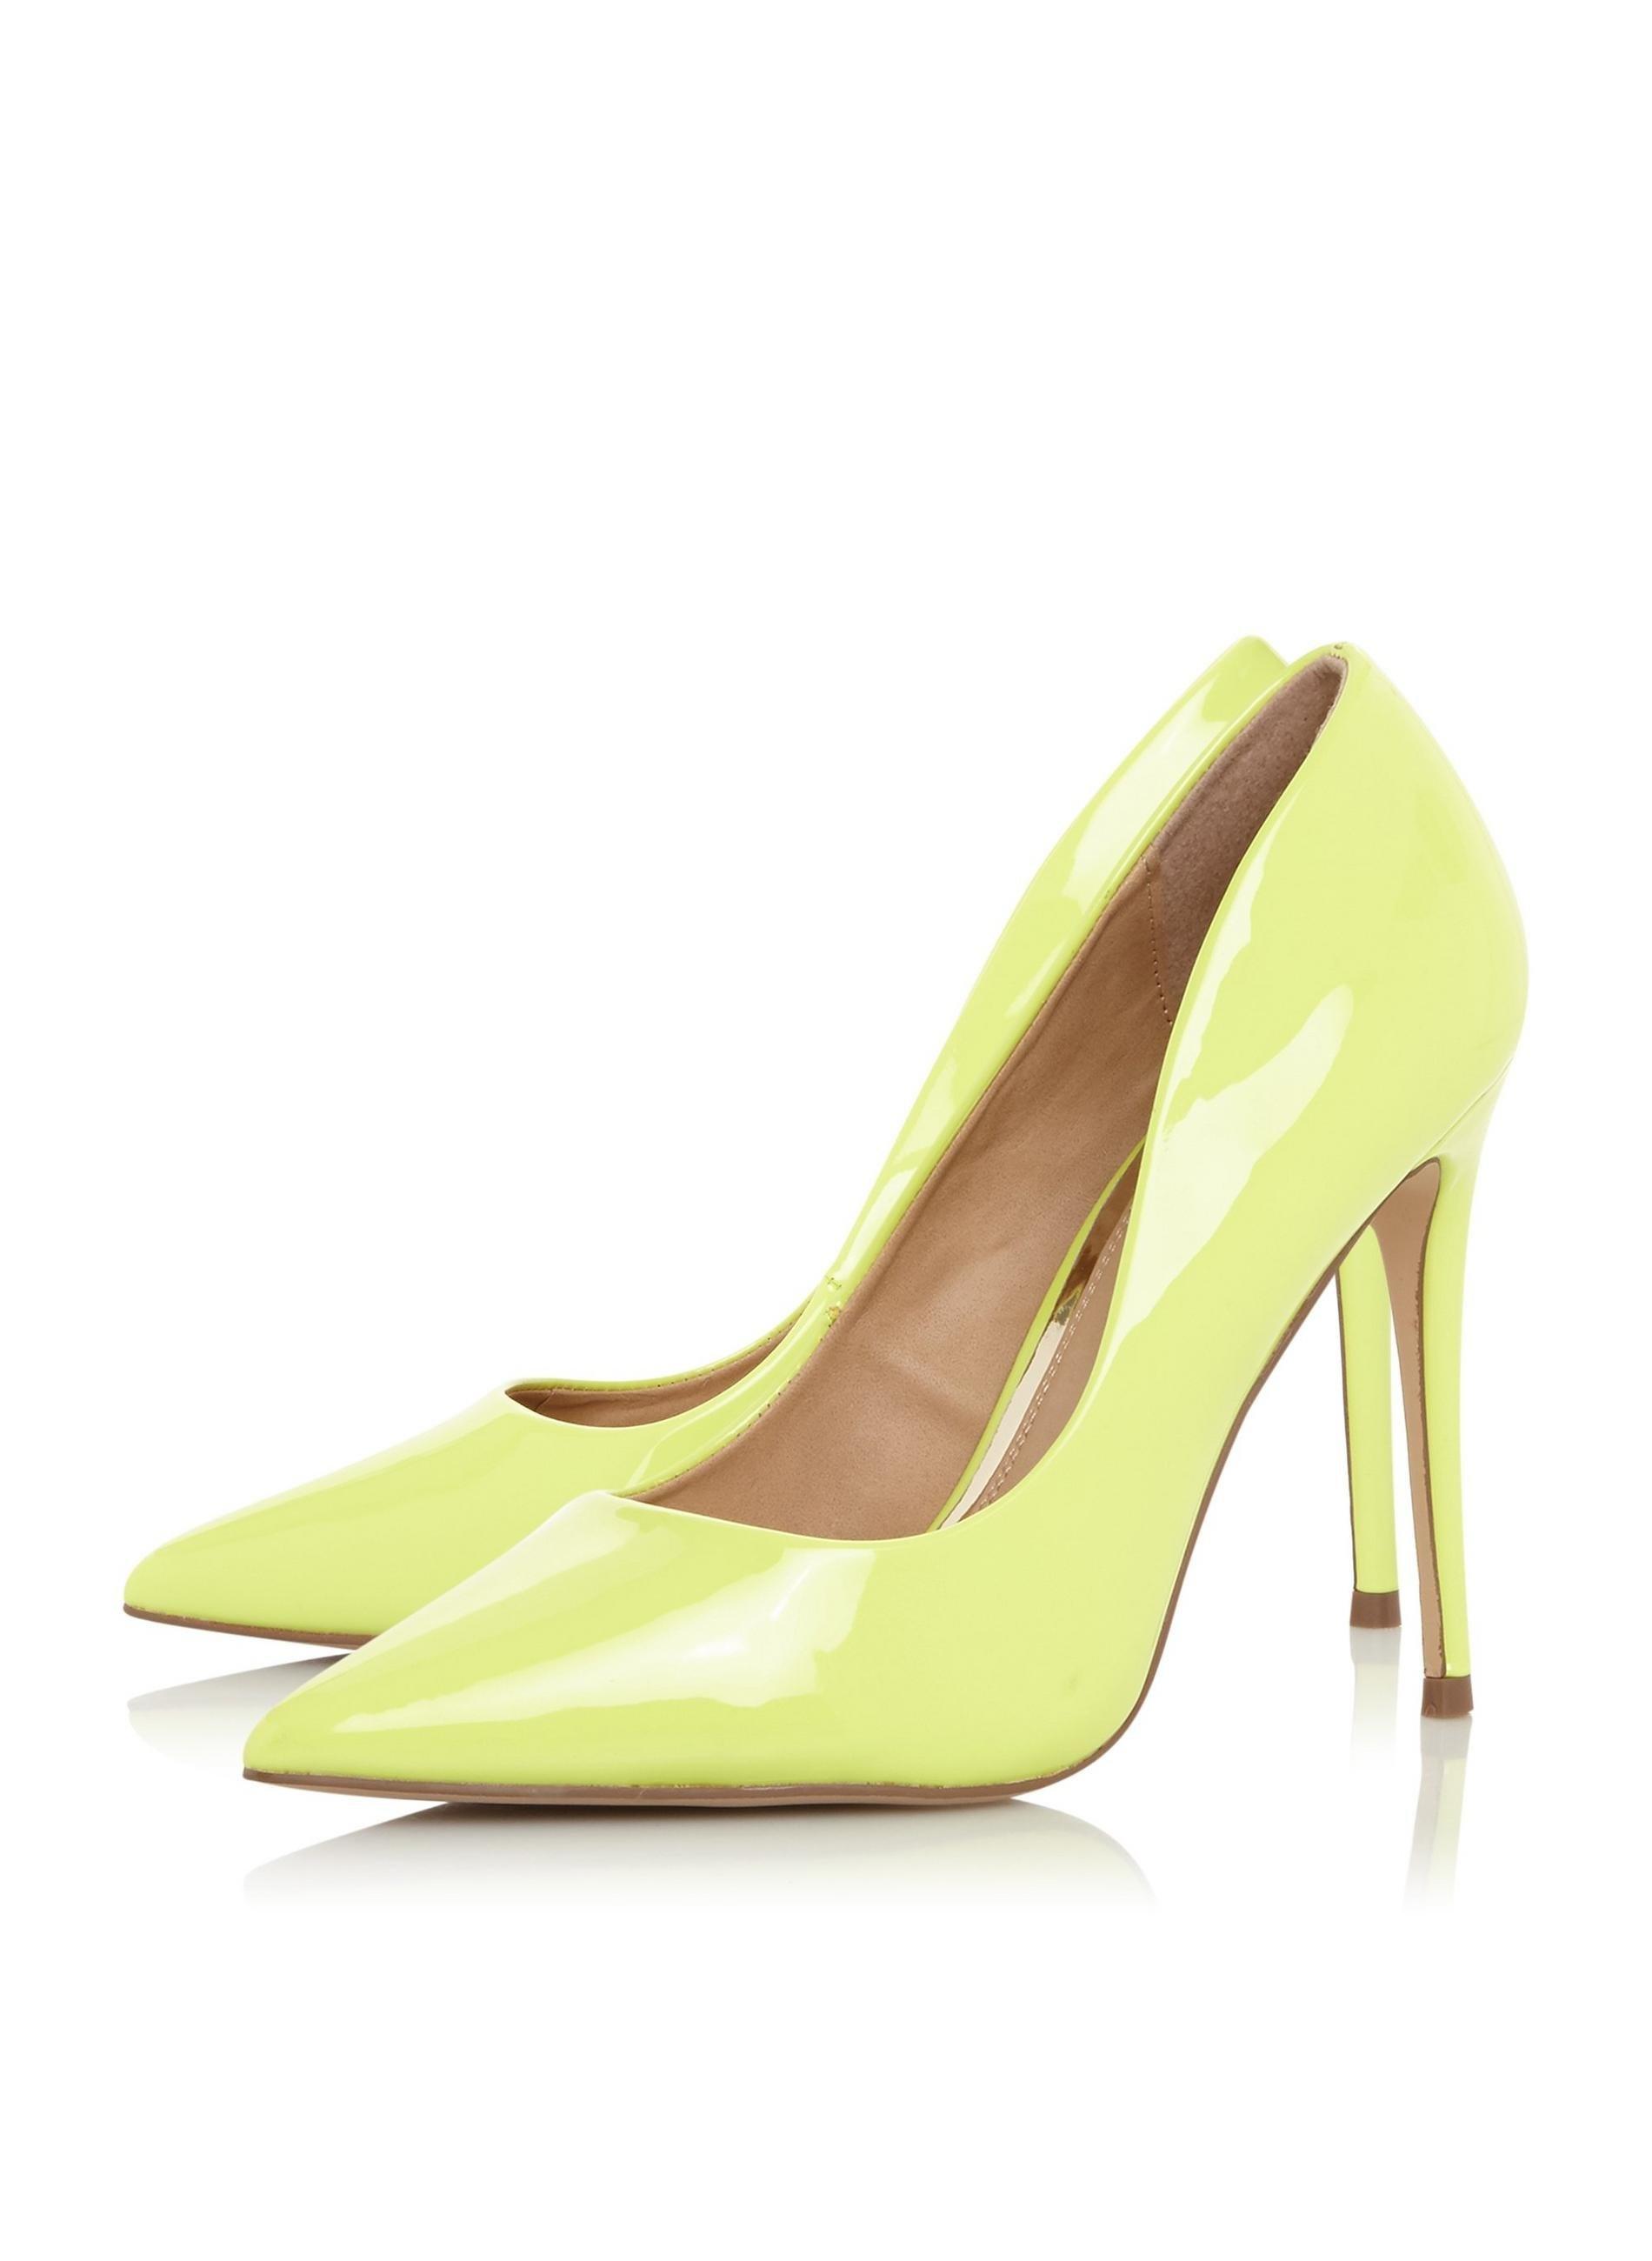 e8fb202a1dd80 ... Dune Lime 'aimees' Court Shoes - Lyst. View fullscreen